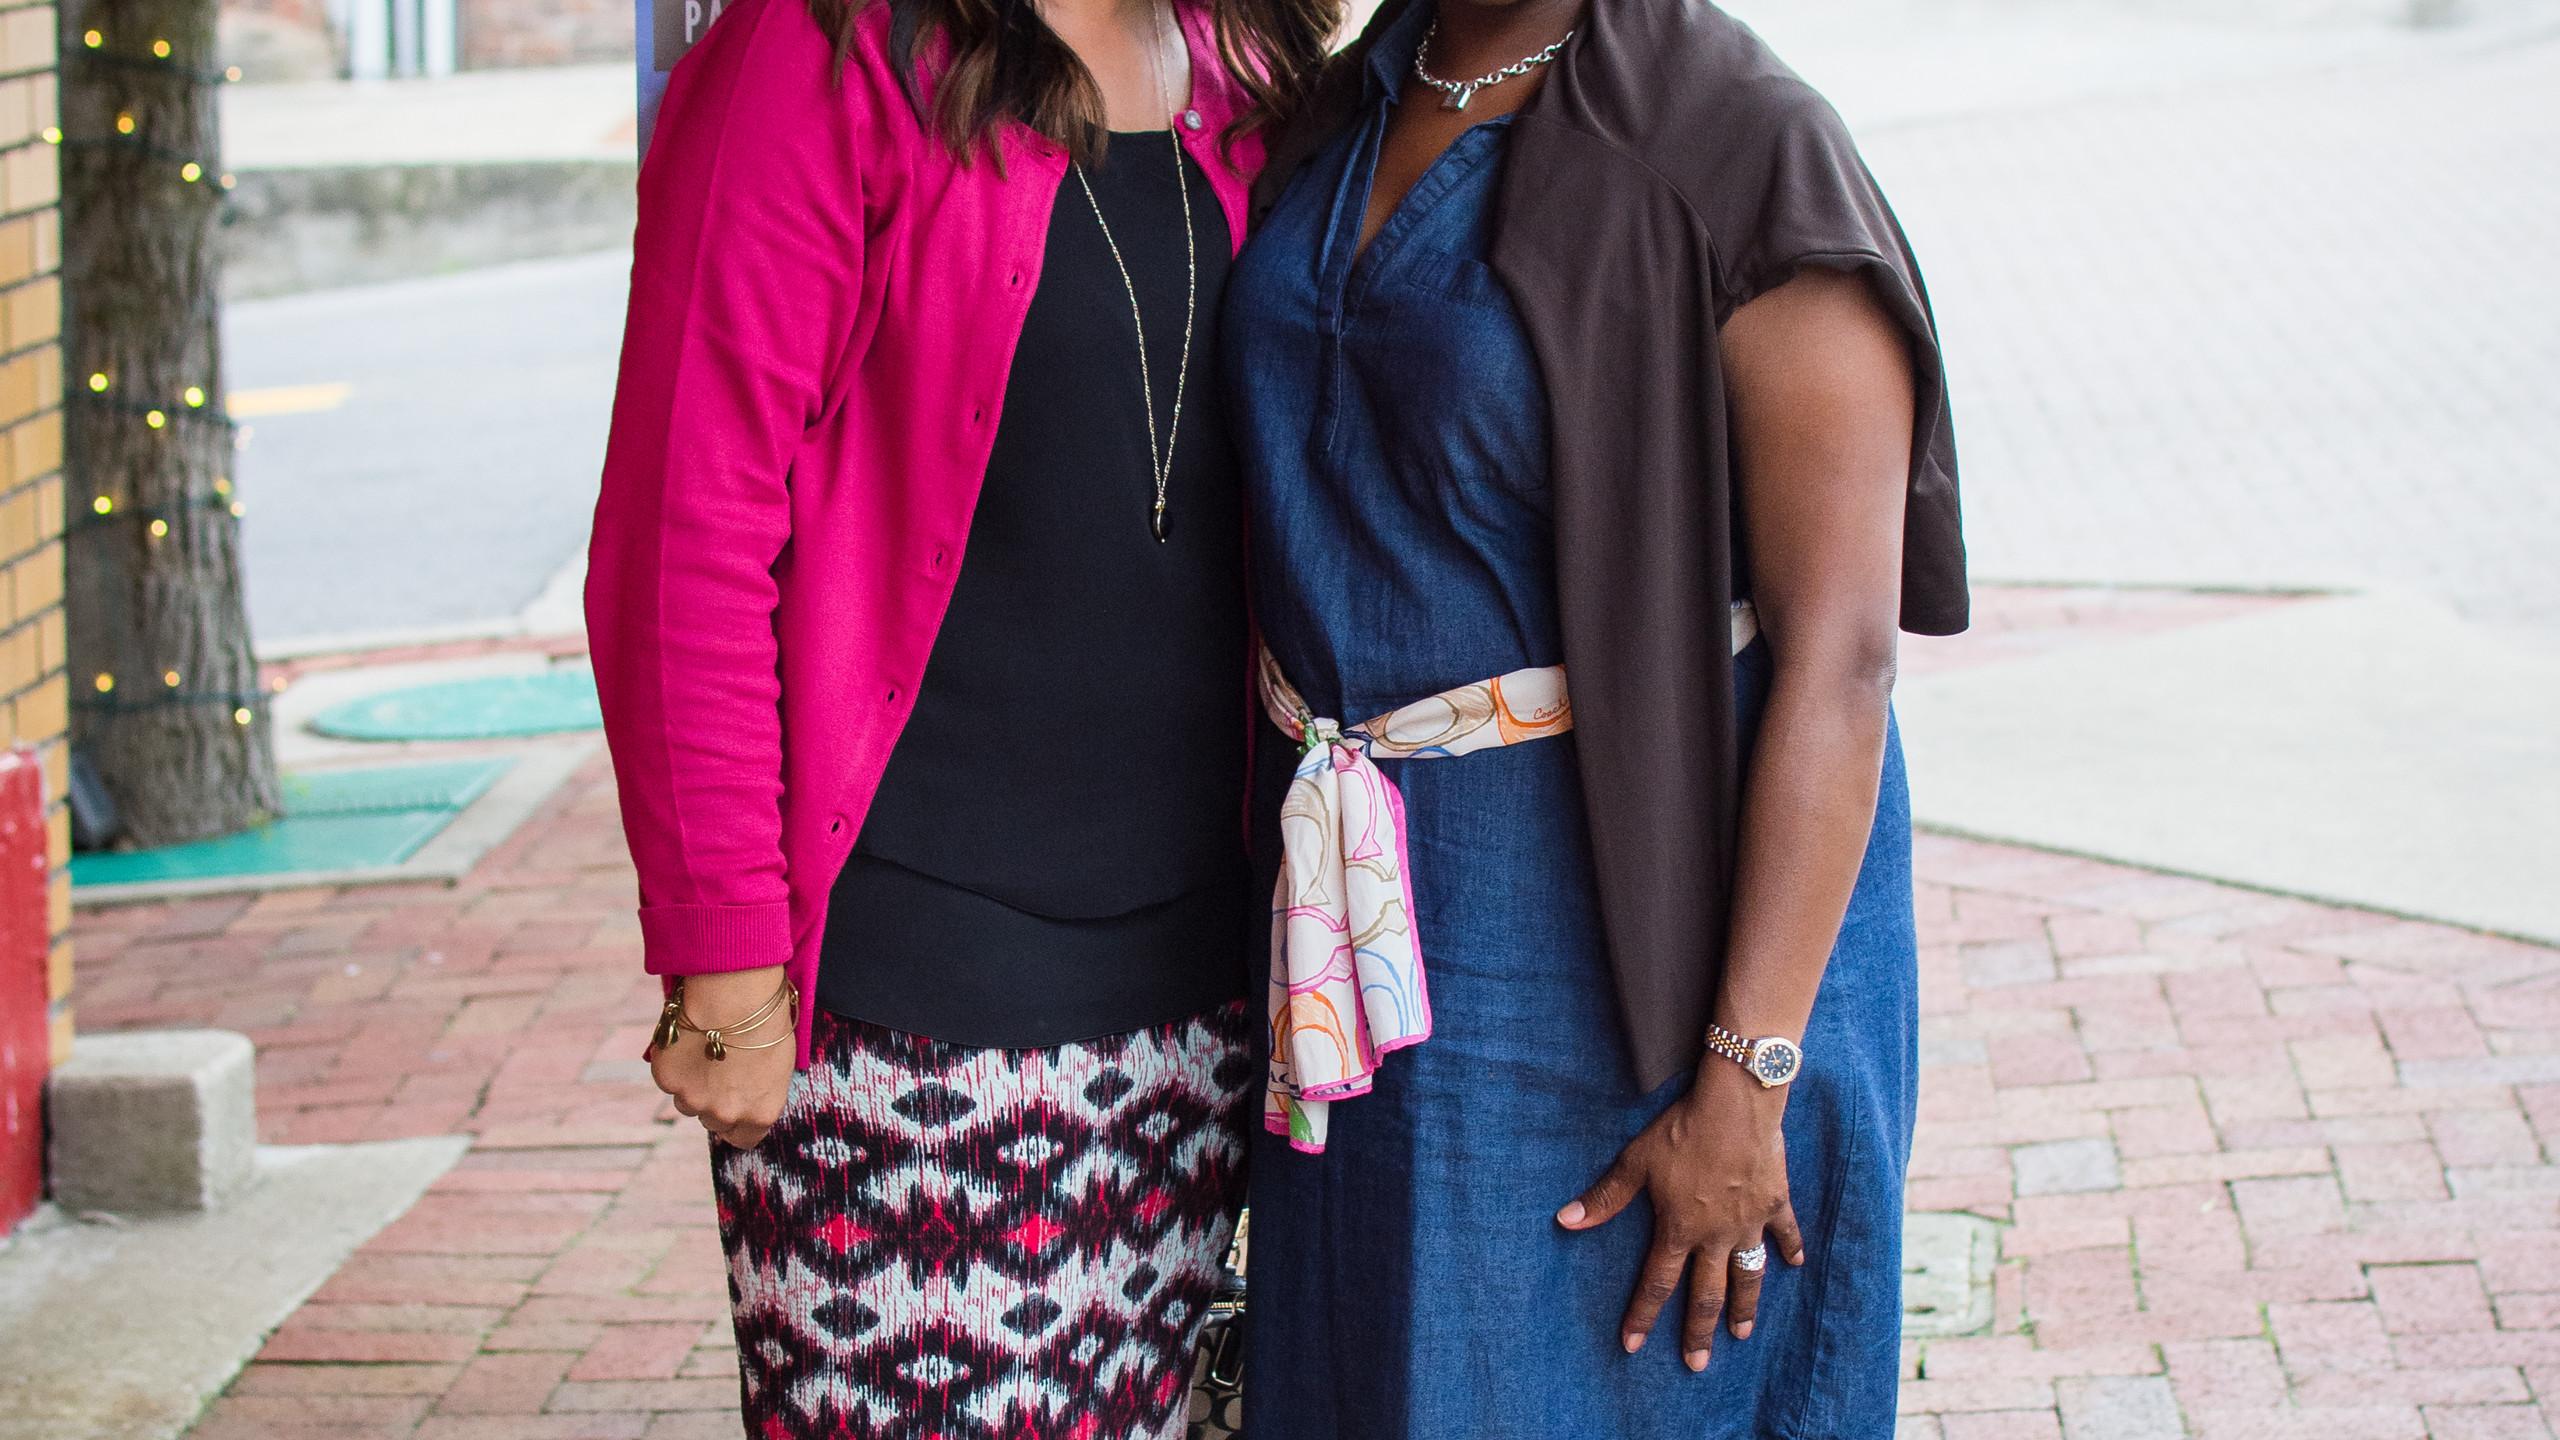 Cheryl Moss and Kimberly Wiggins